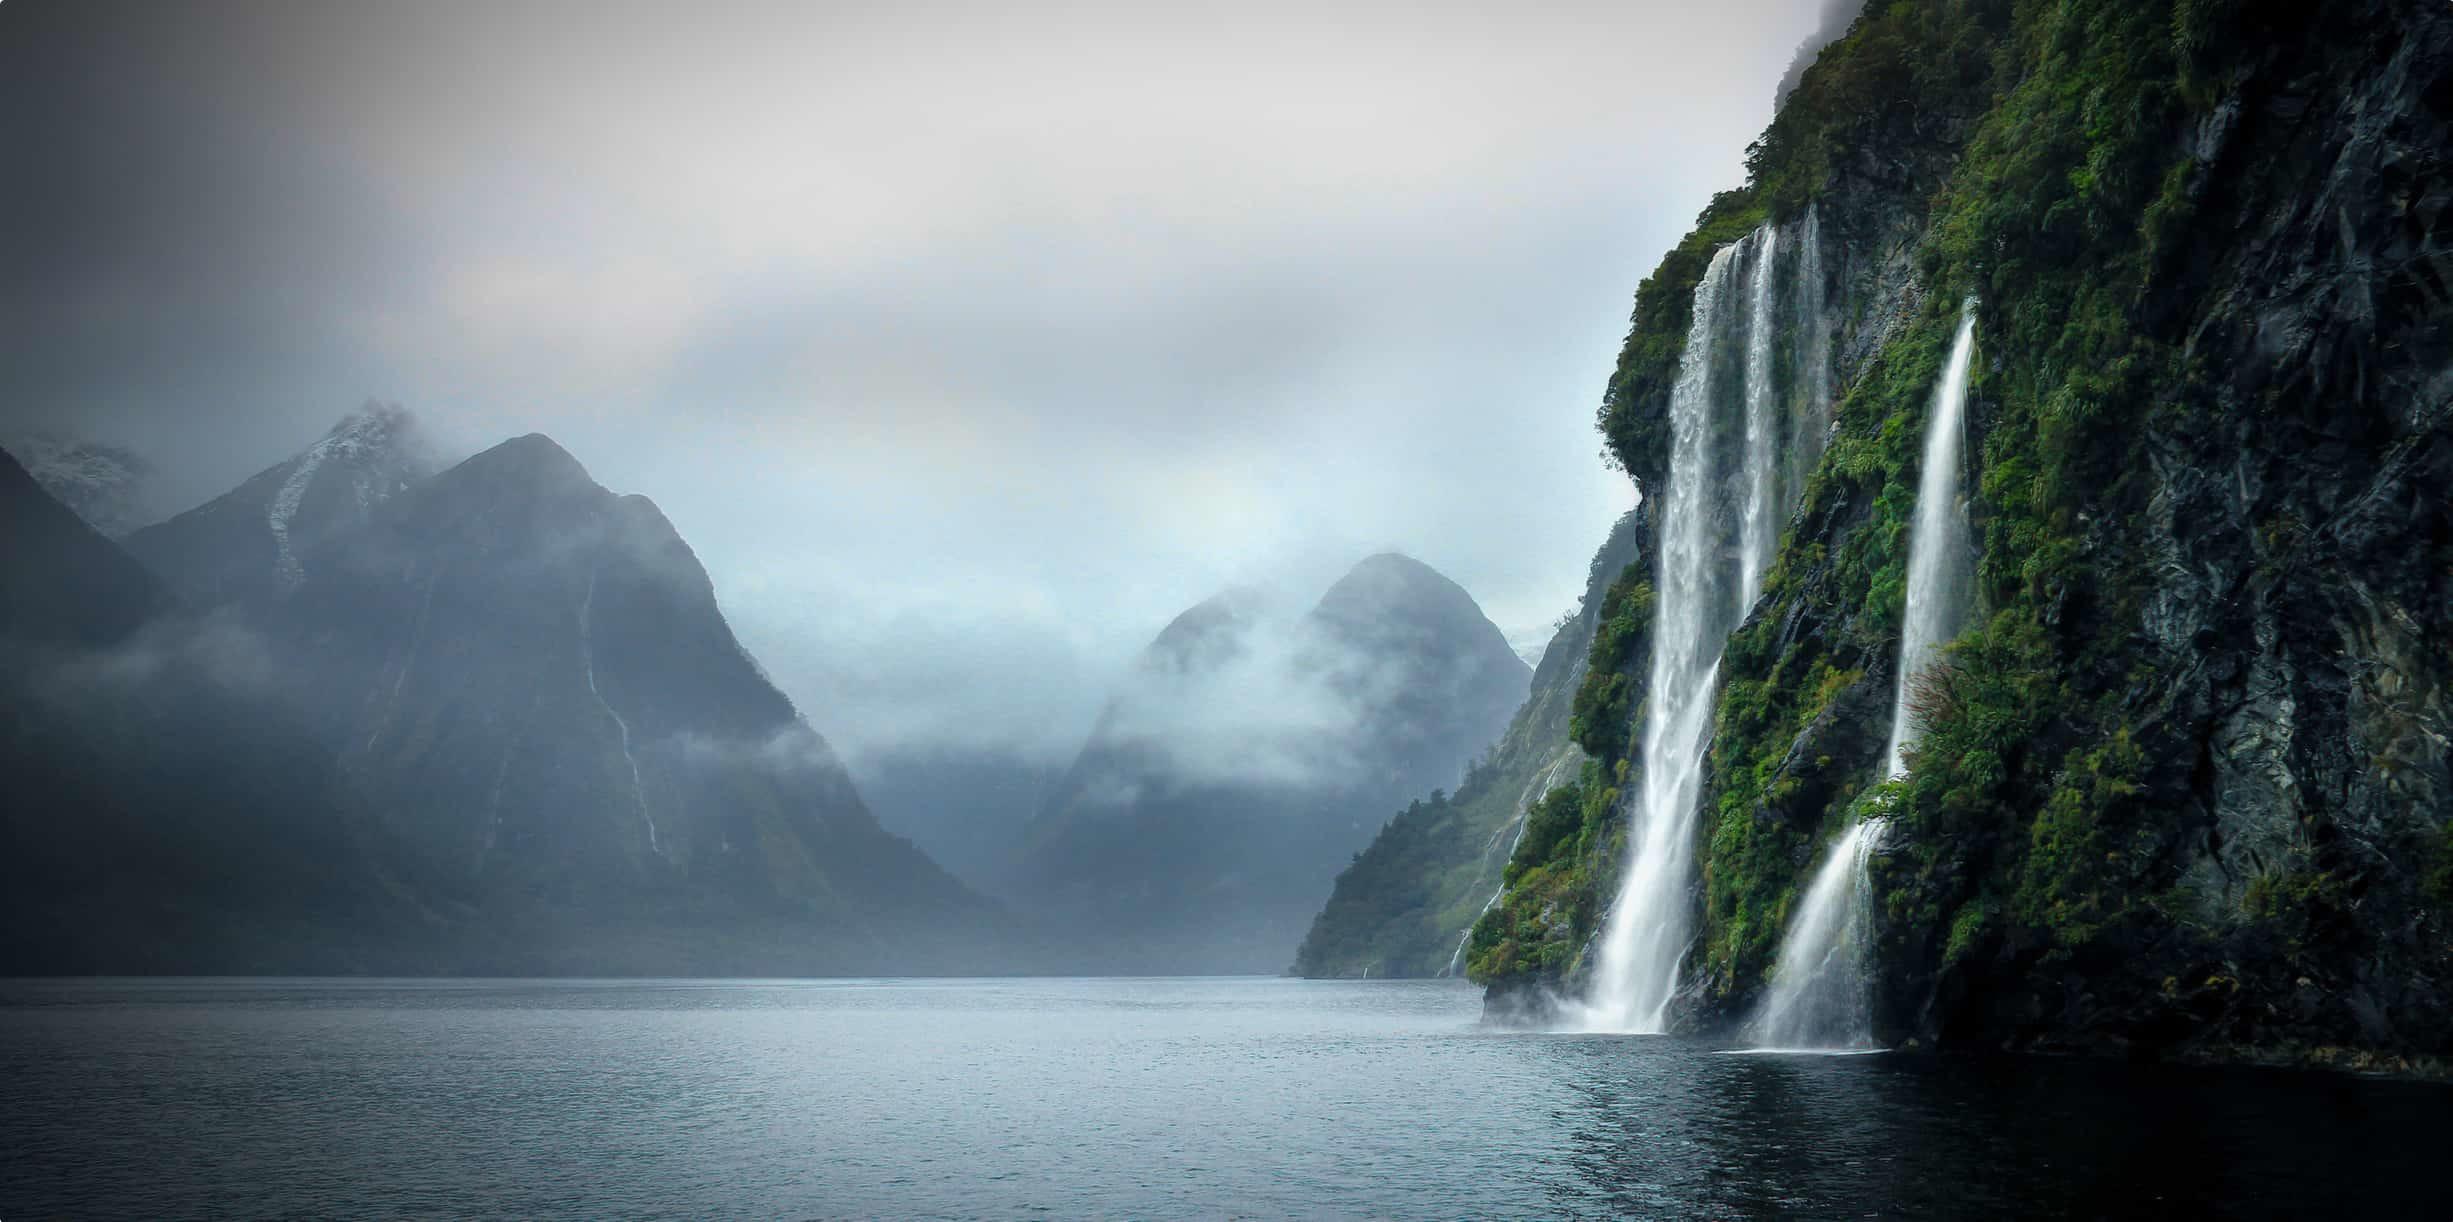 Doubtful Sound, Fjordland in New Zealand